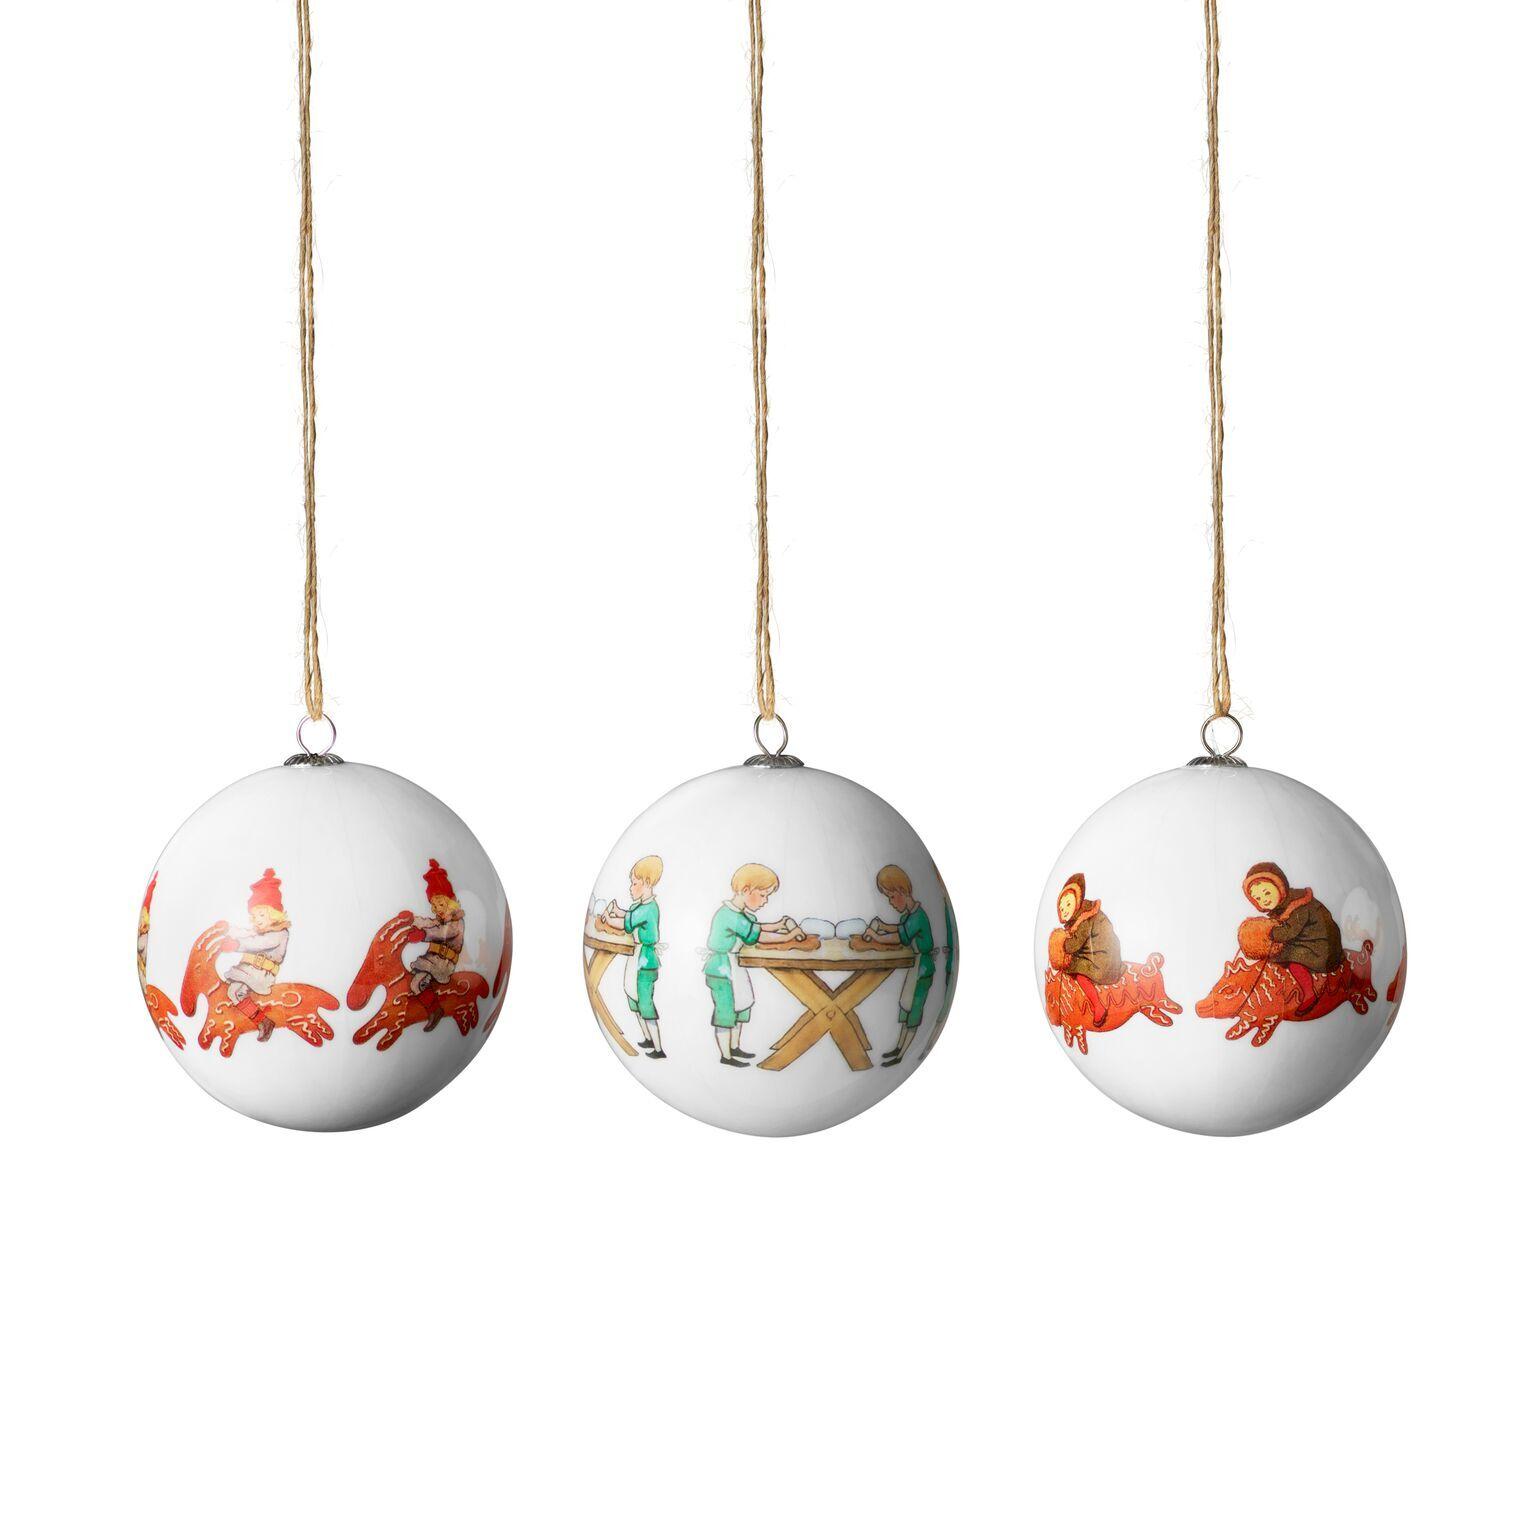 Design House Elsa Beskow Christmas Tree Ornaments, Peter & Lottas Christmas